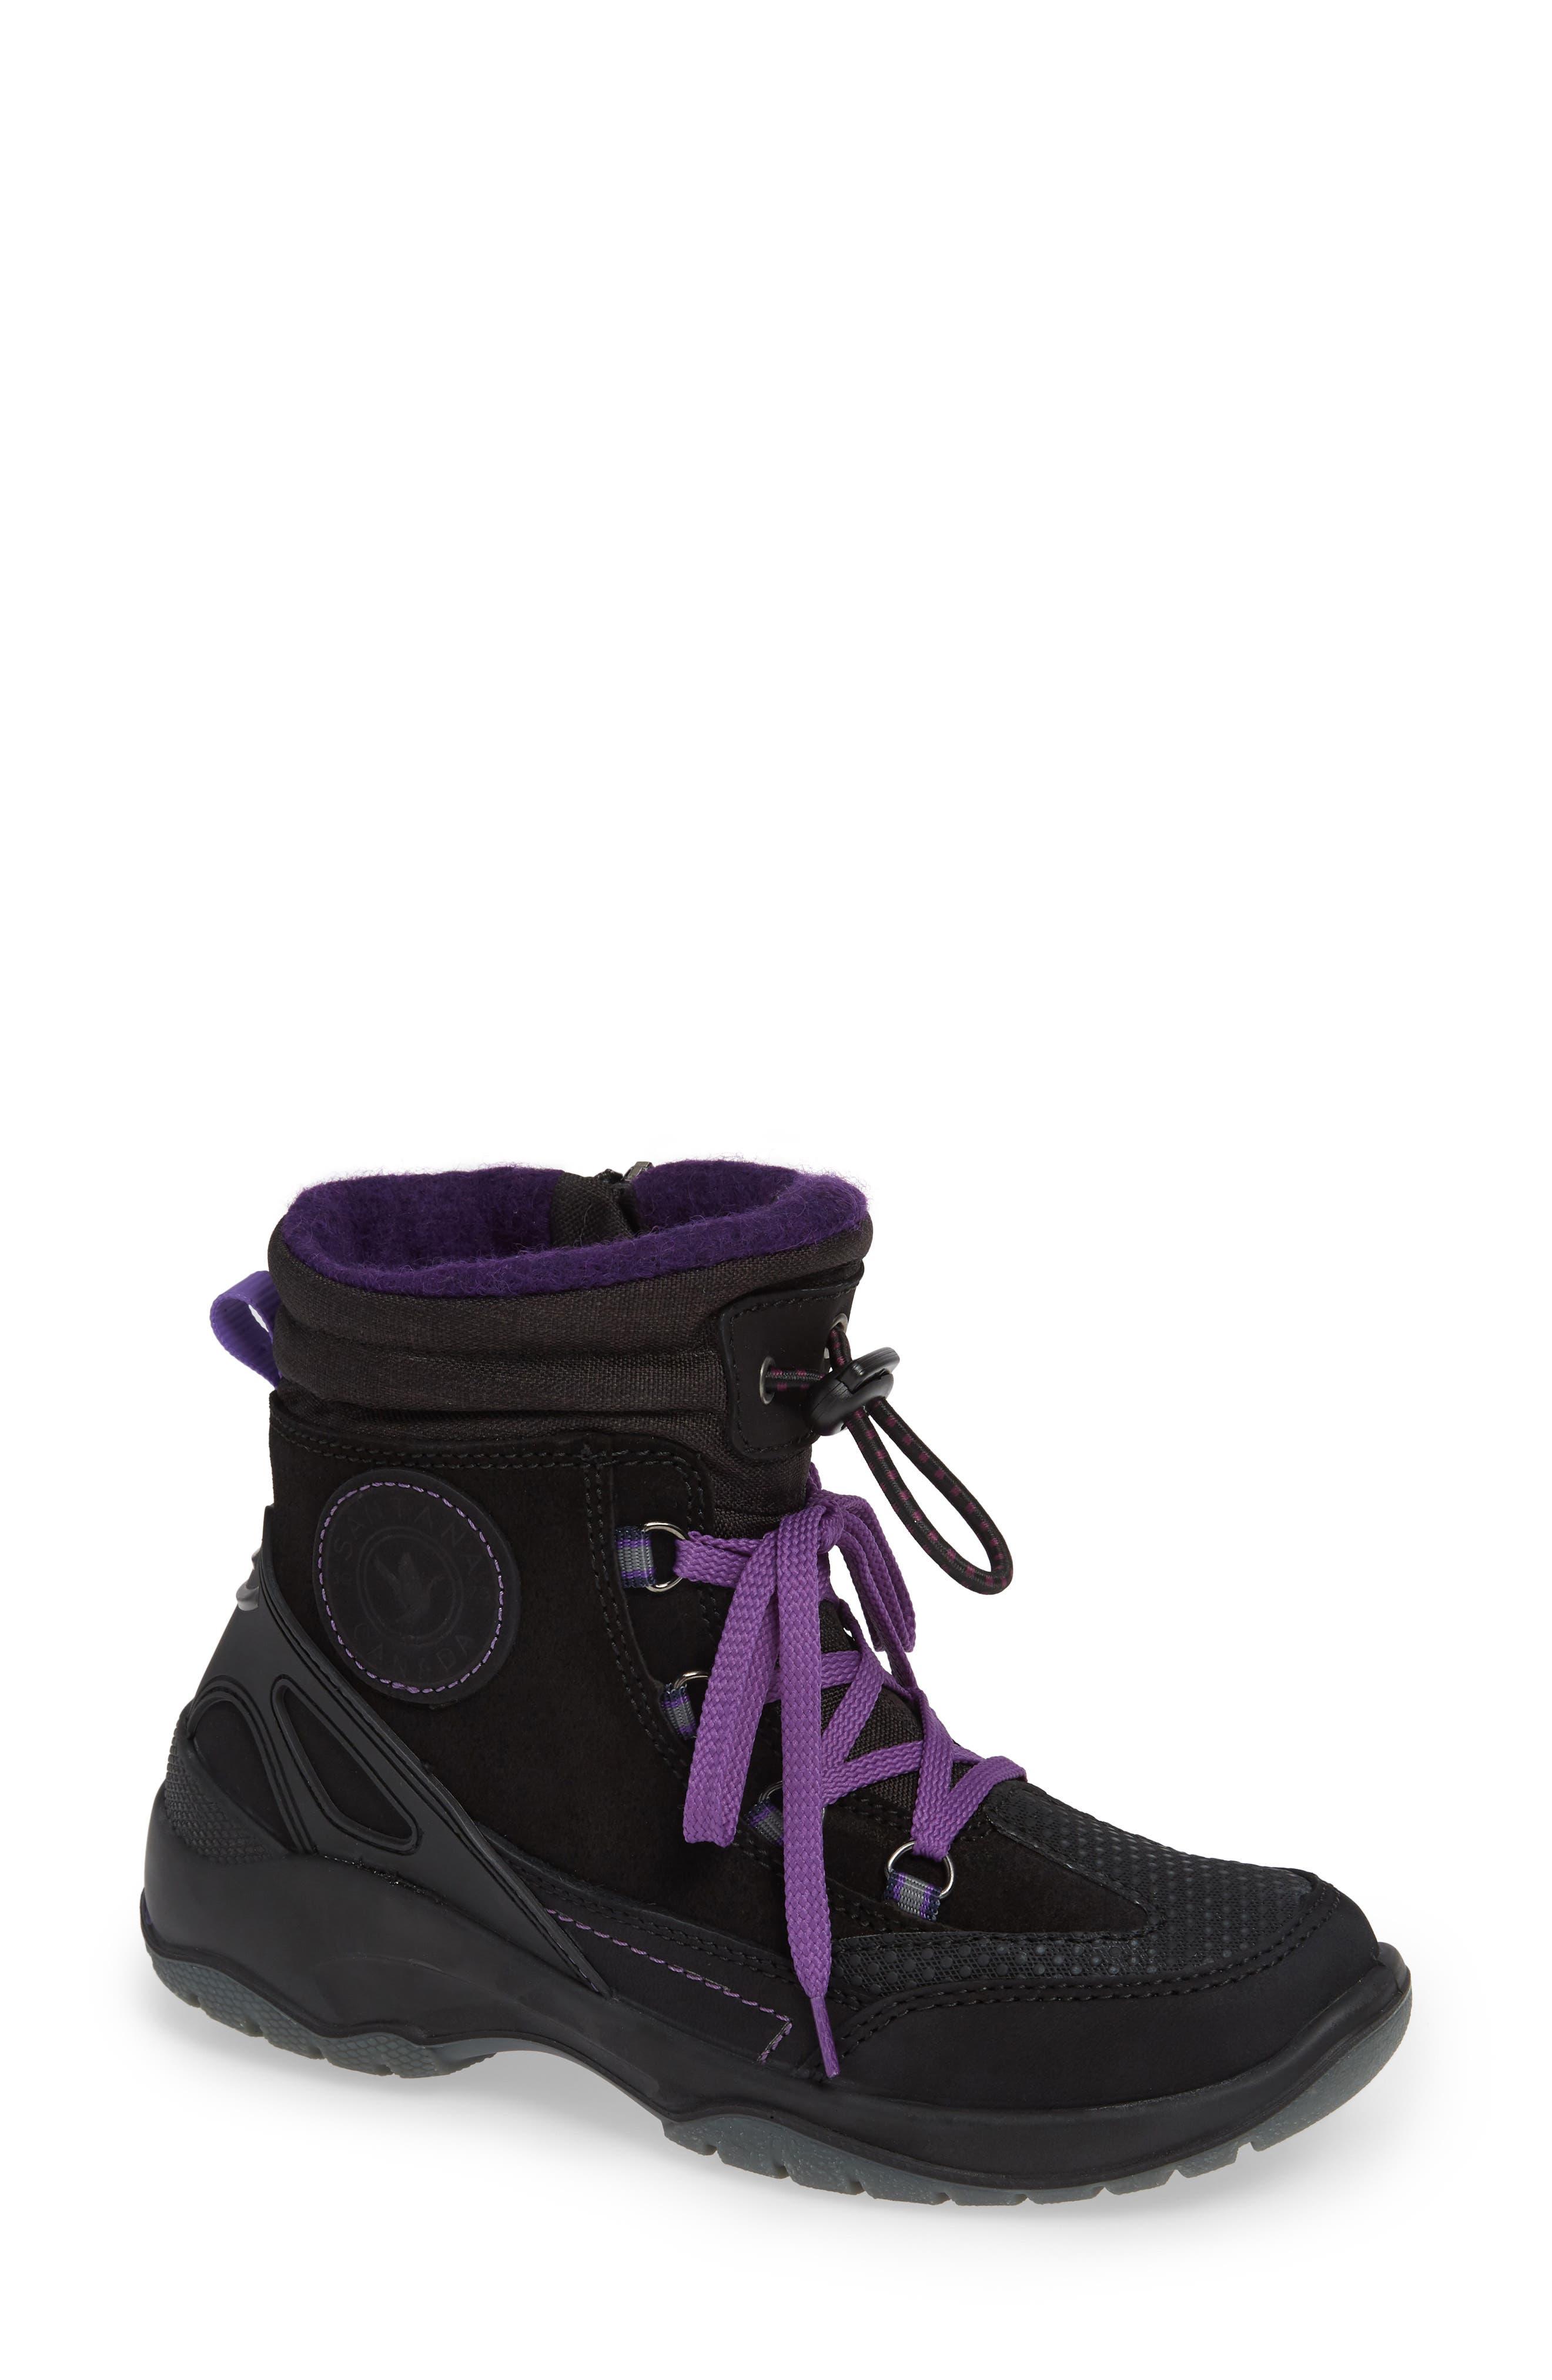 Santana Canada Torino Waterproof Insulated Lace-Up Winter Boot